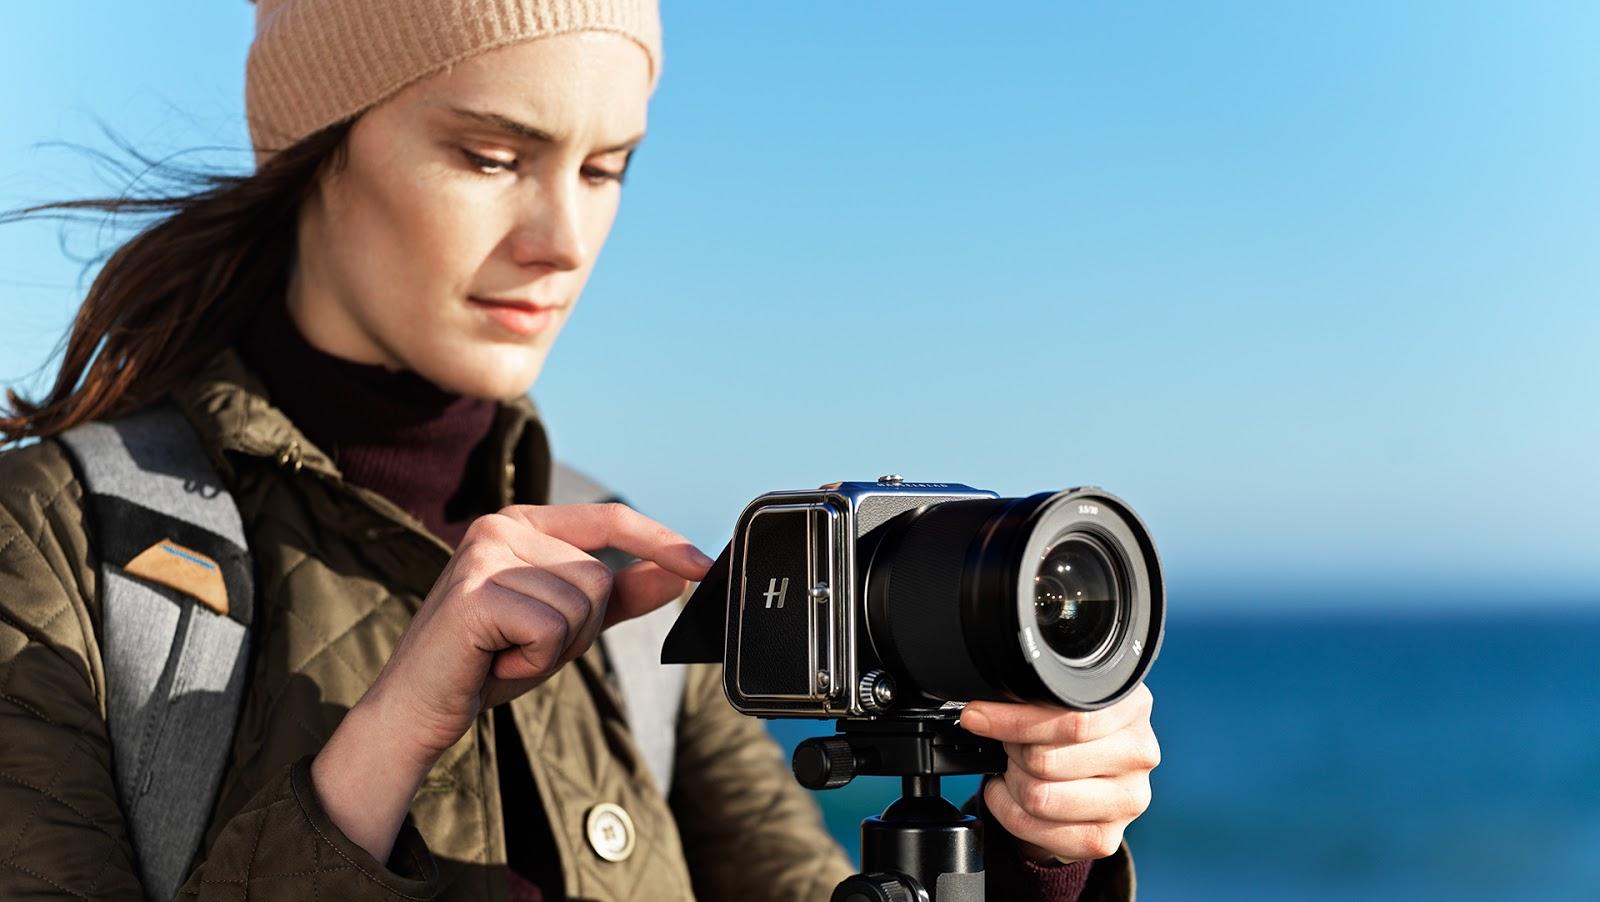 Девушка-фотограф с камерой Hasselblad 907X 50C